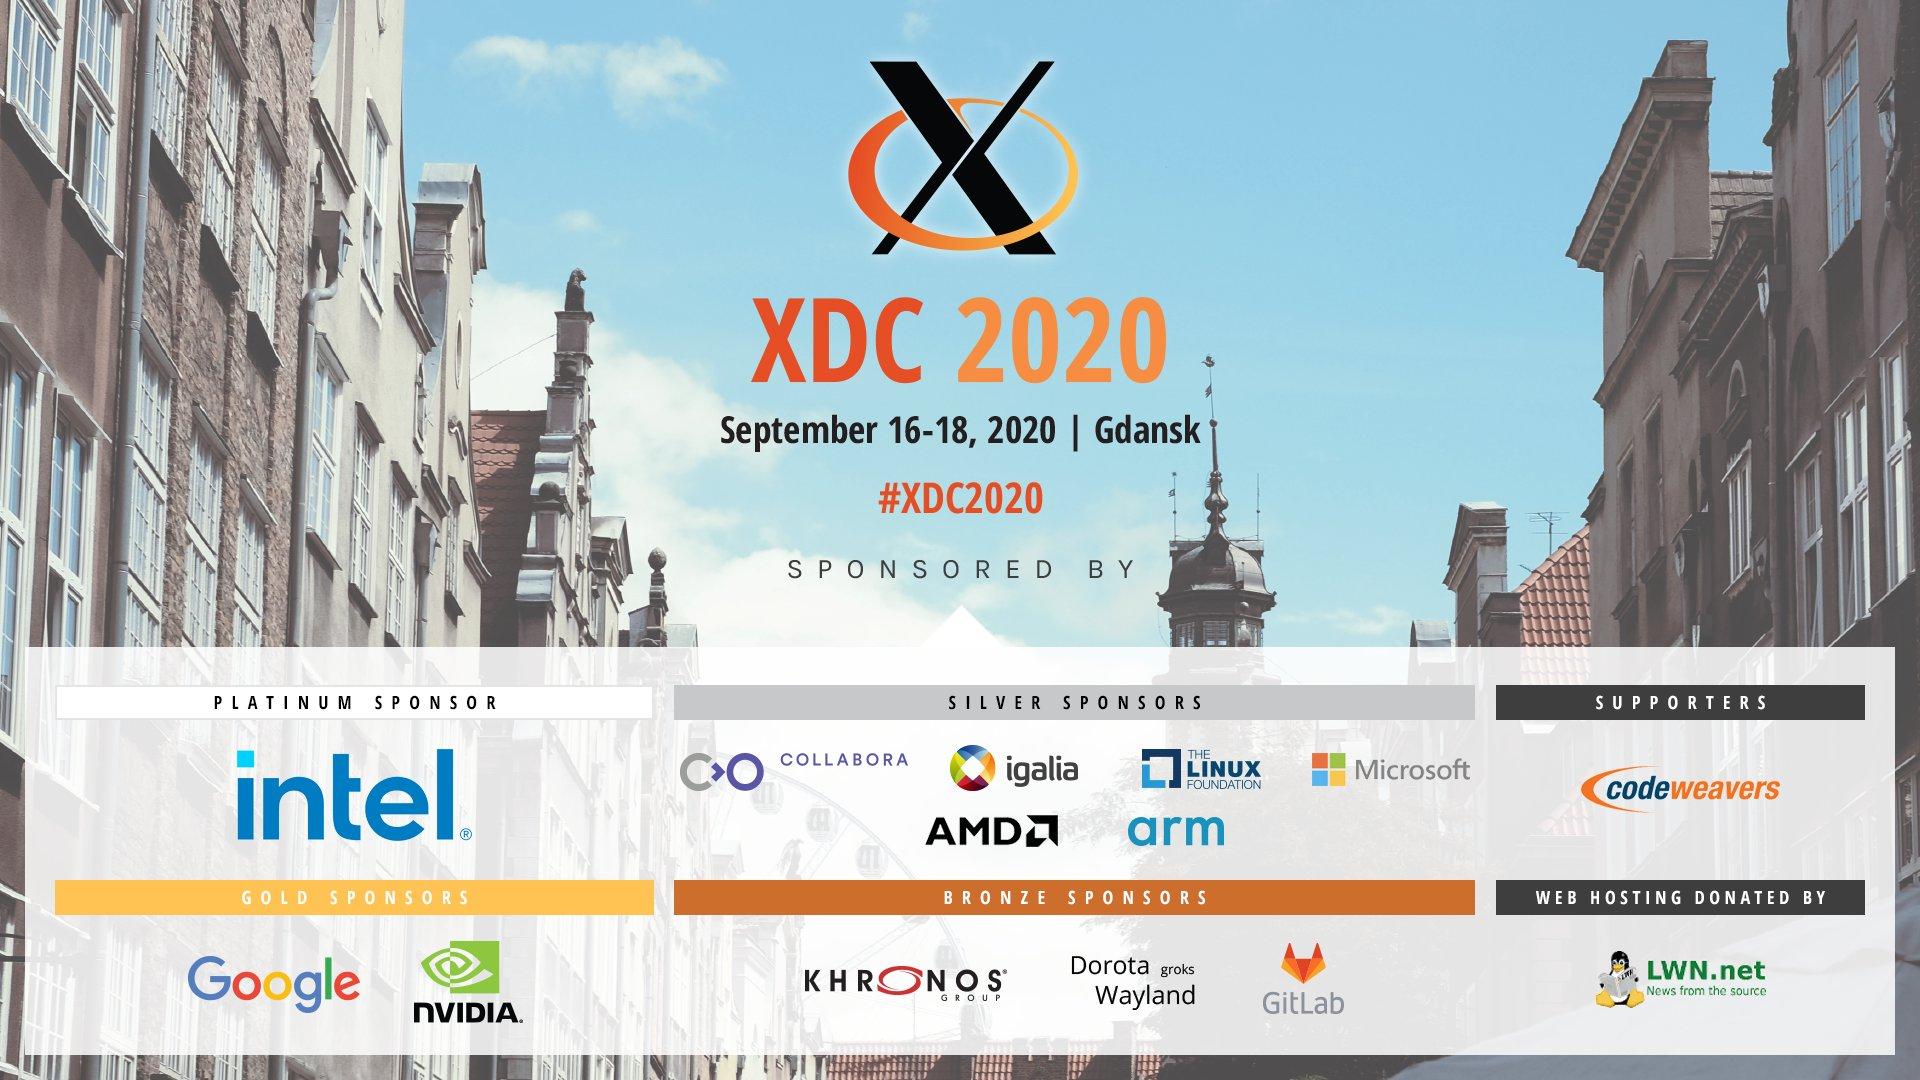 XDC 2020 sponsors